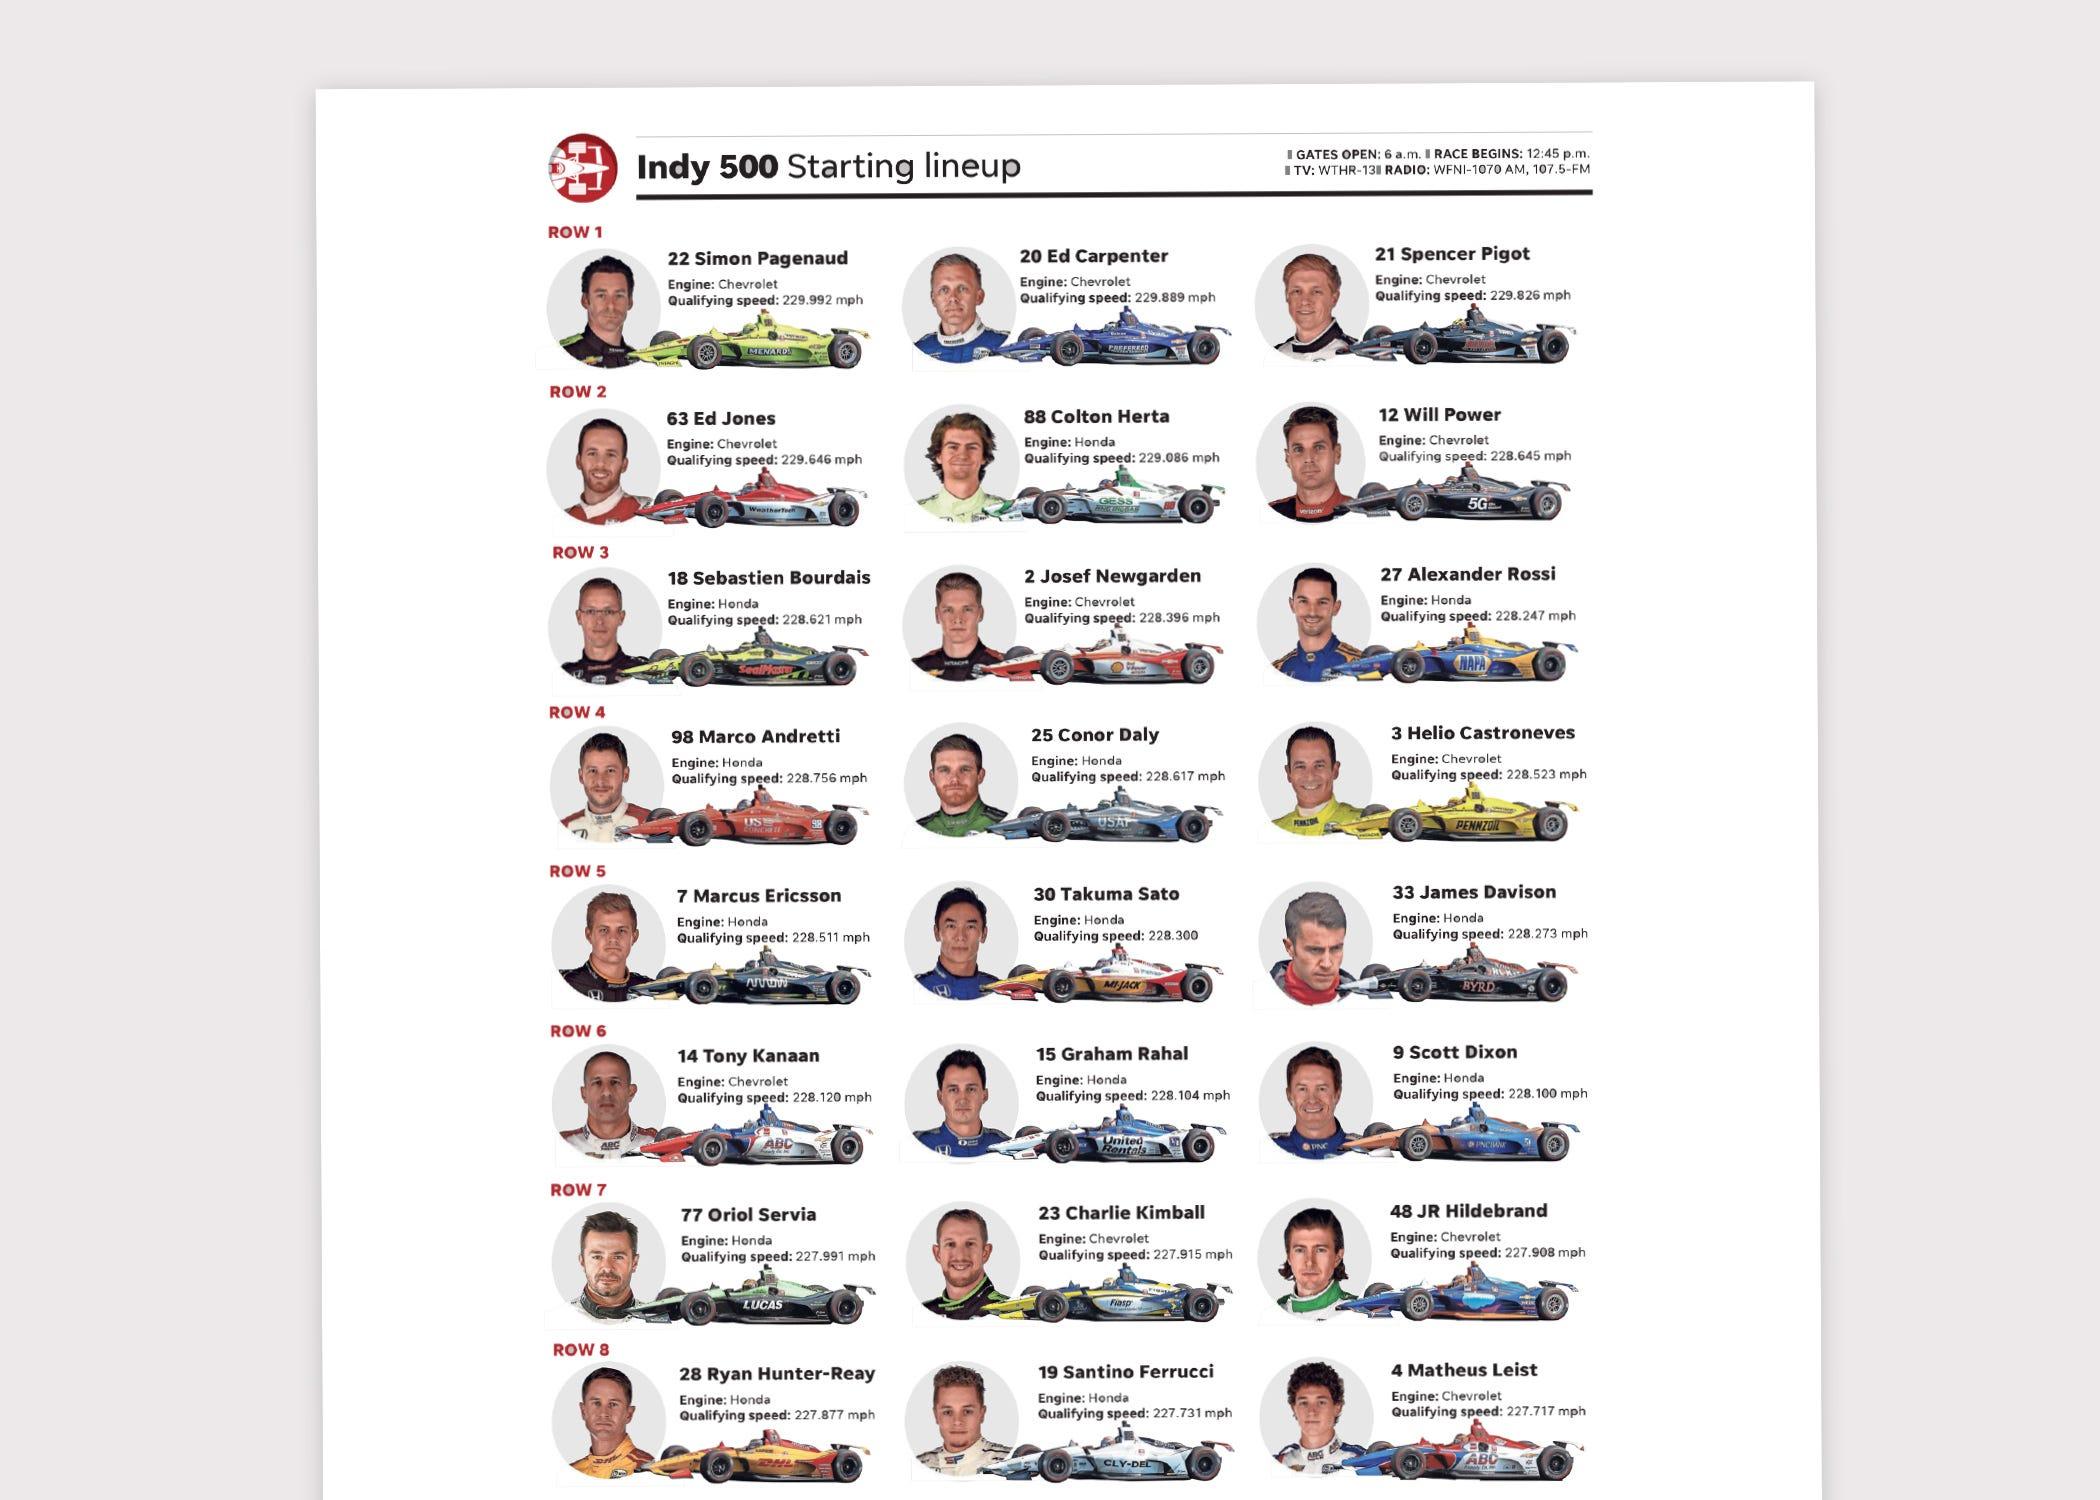 image regarding Printable Indy 500 Starting Grid identify Indy 500 lineup: Printable starting off grid for the 2019 race